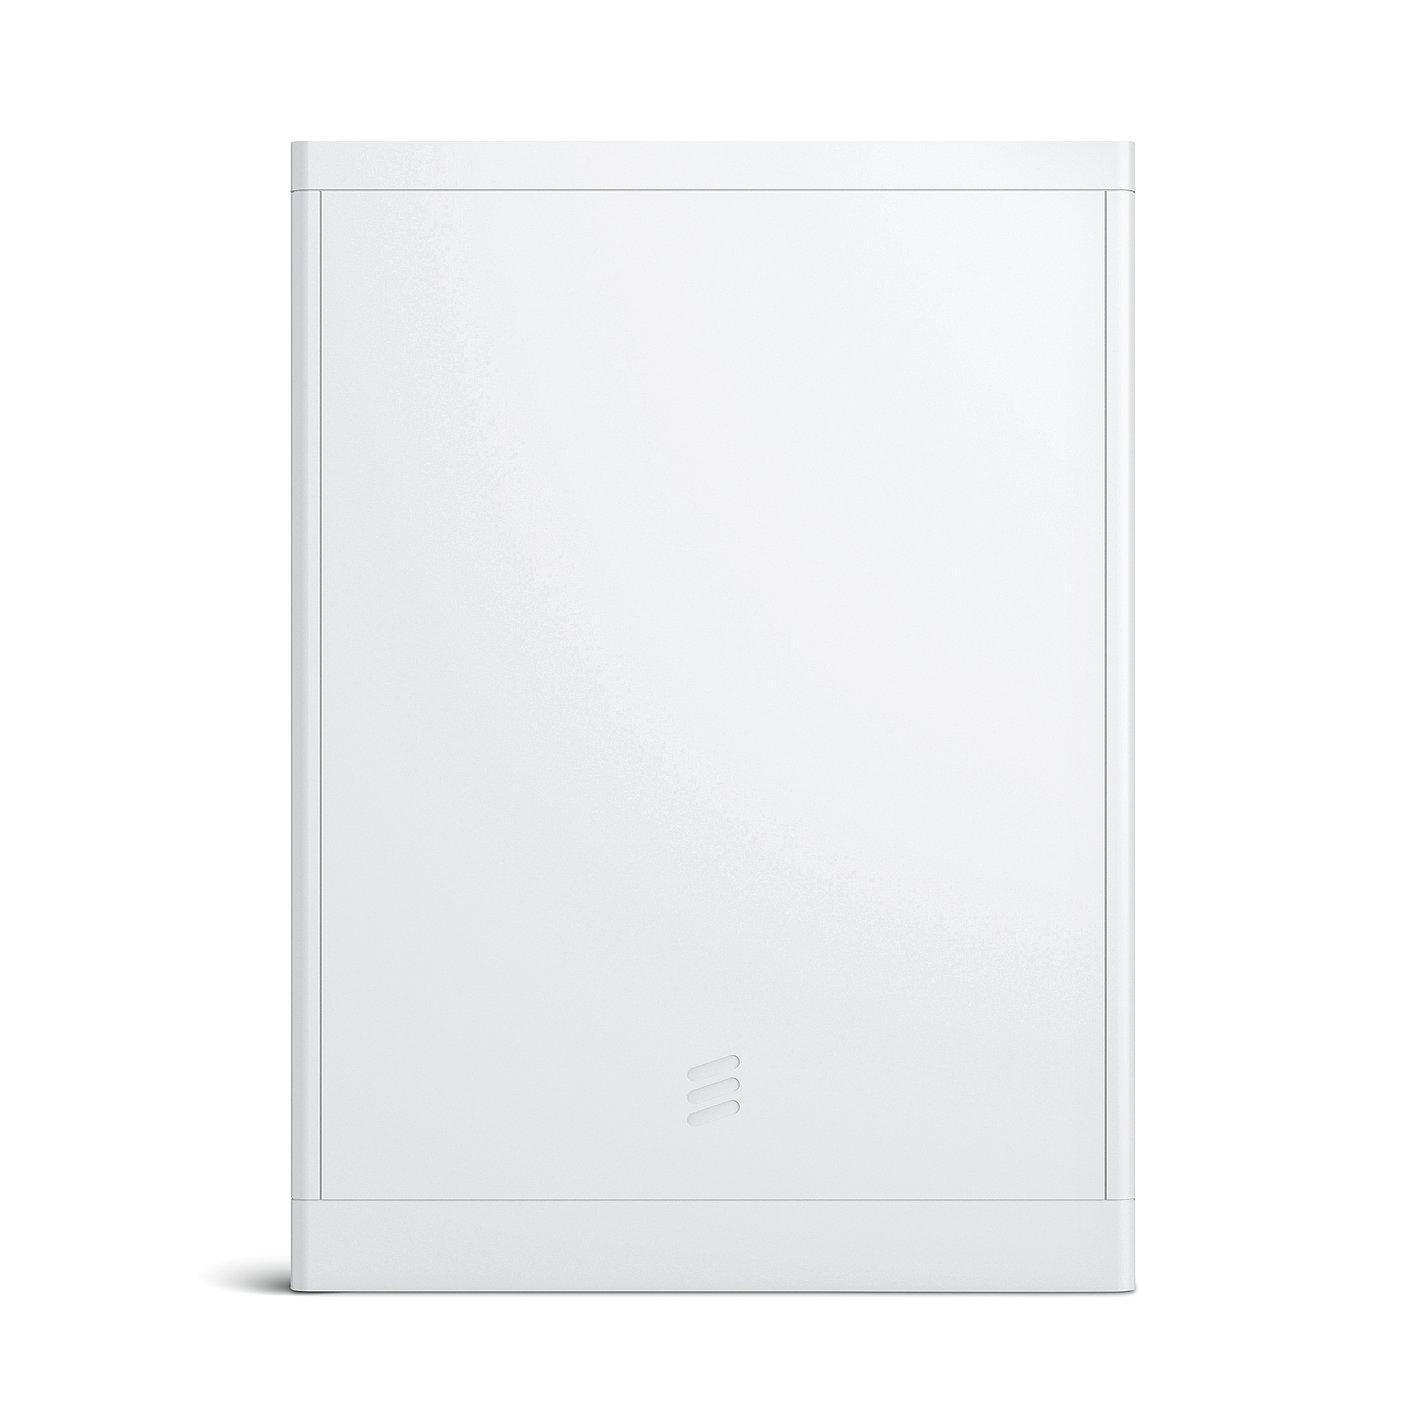 Ericsson AIR 3239 | Red Dot Design Award